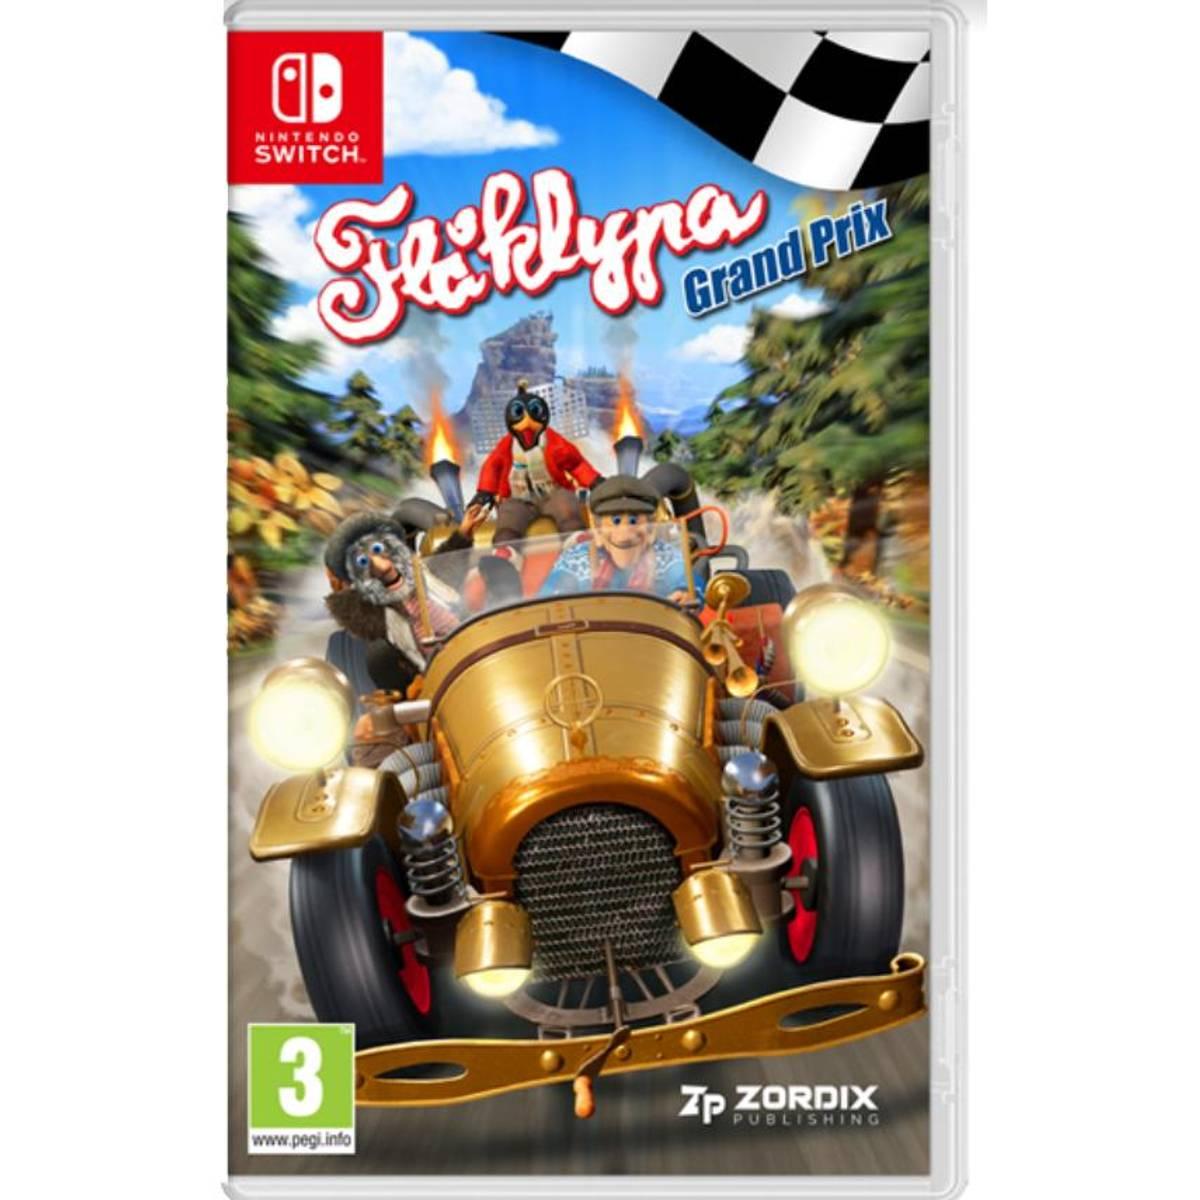 Flåklypa Grand Prix (Nintendo Switch)